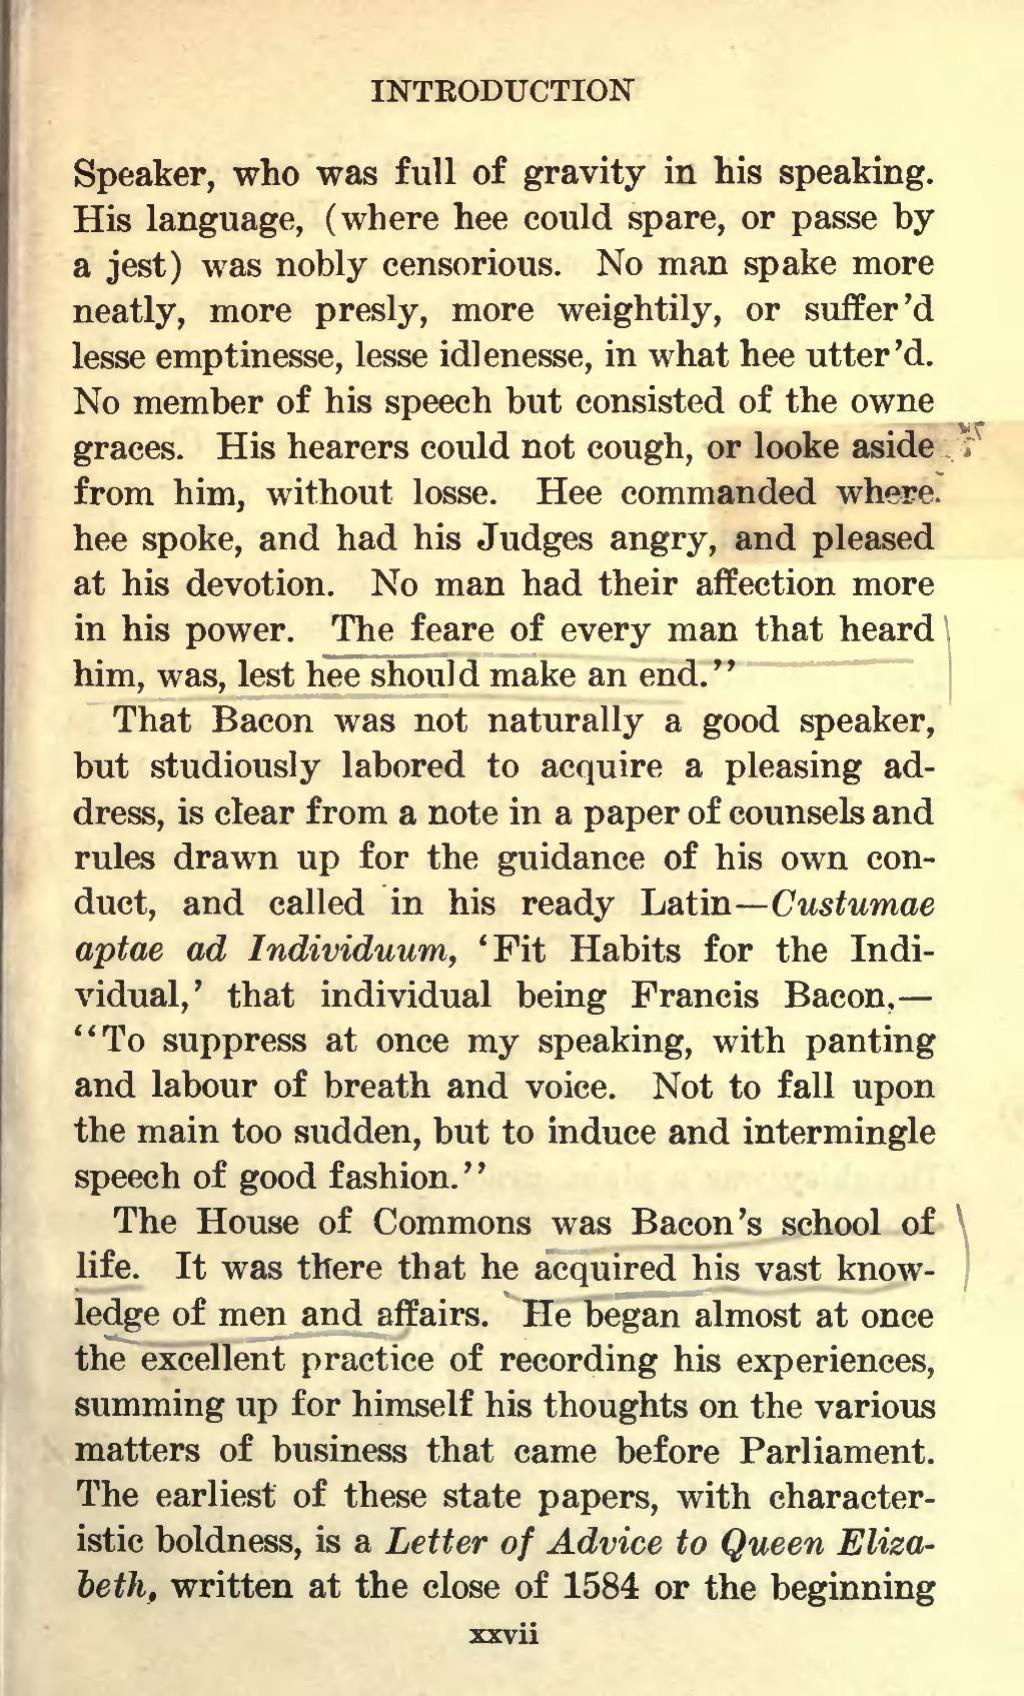 004 Essay Example Bacons Essays Page35 1024px Of Francis Bacon 1908 Scott Amazing Google Books Truth Quiz Bacon's Summary Large